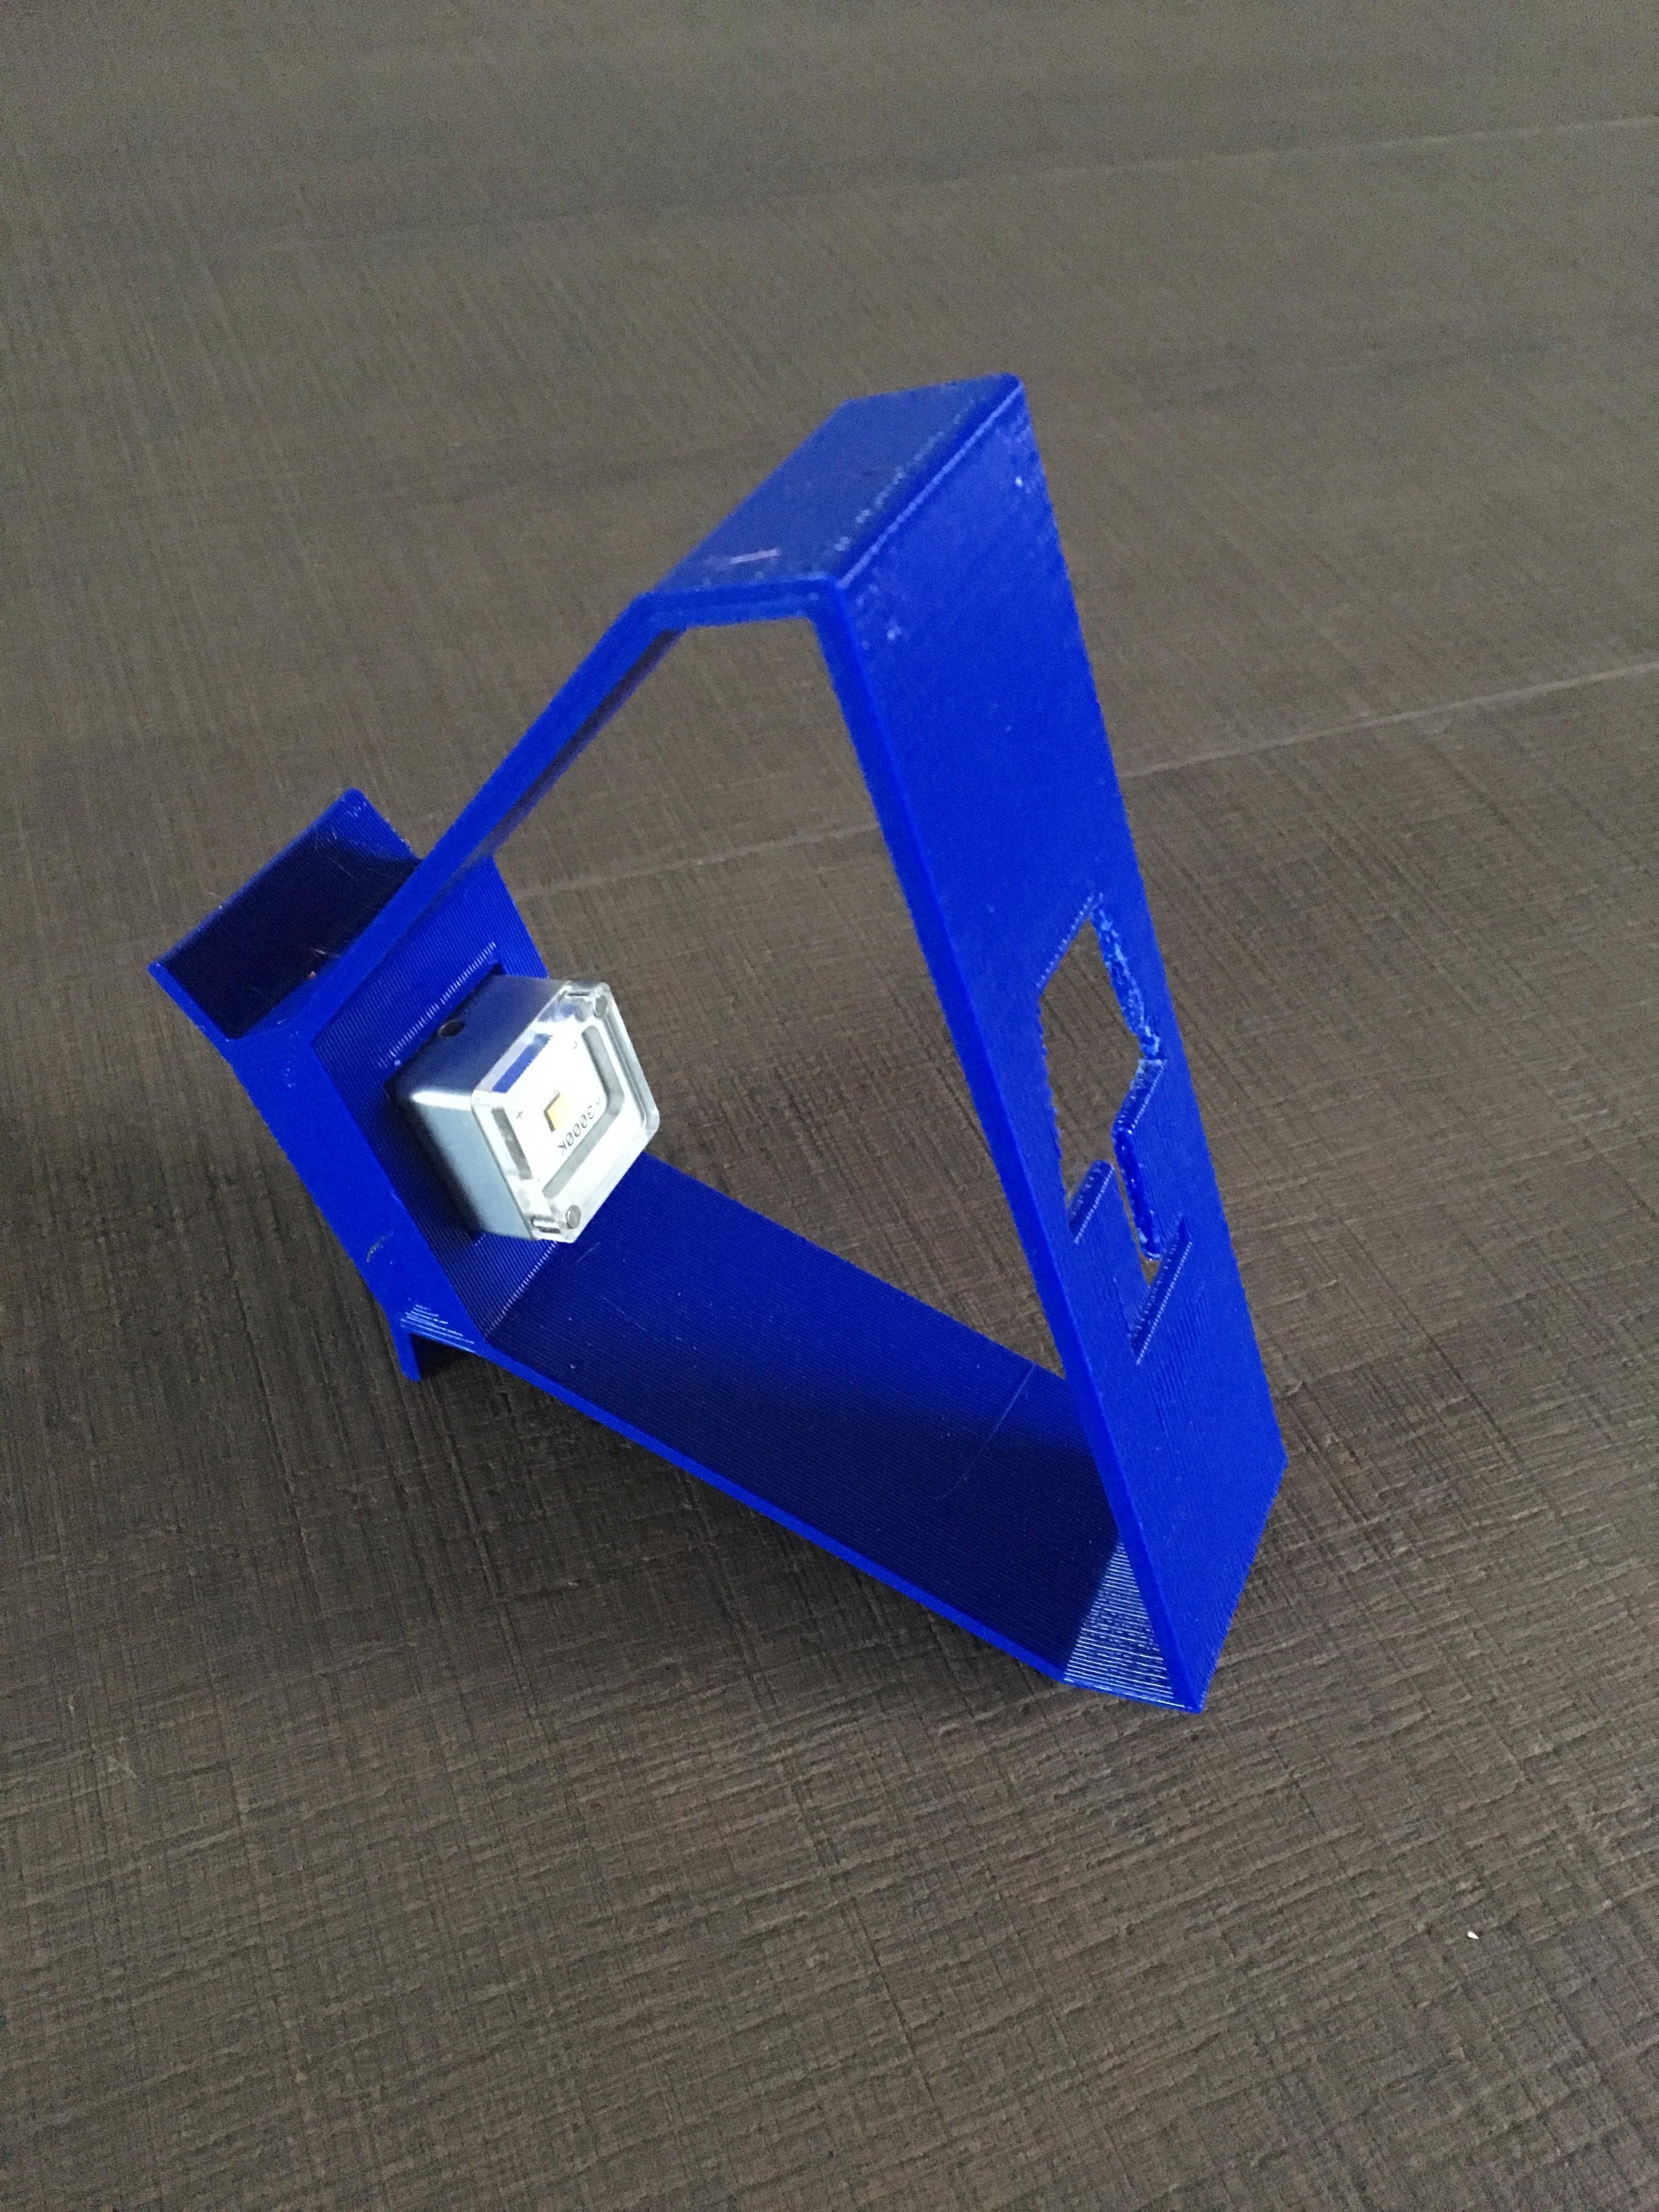 IMG_6734.jpg Download free STL file LED LIGHT • 3D printer model, Byctrldesign